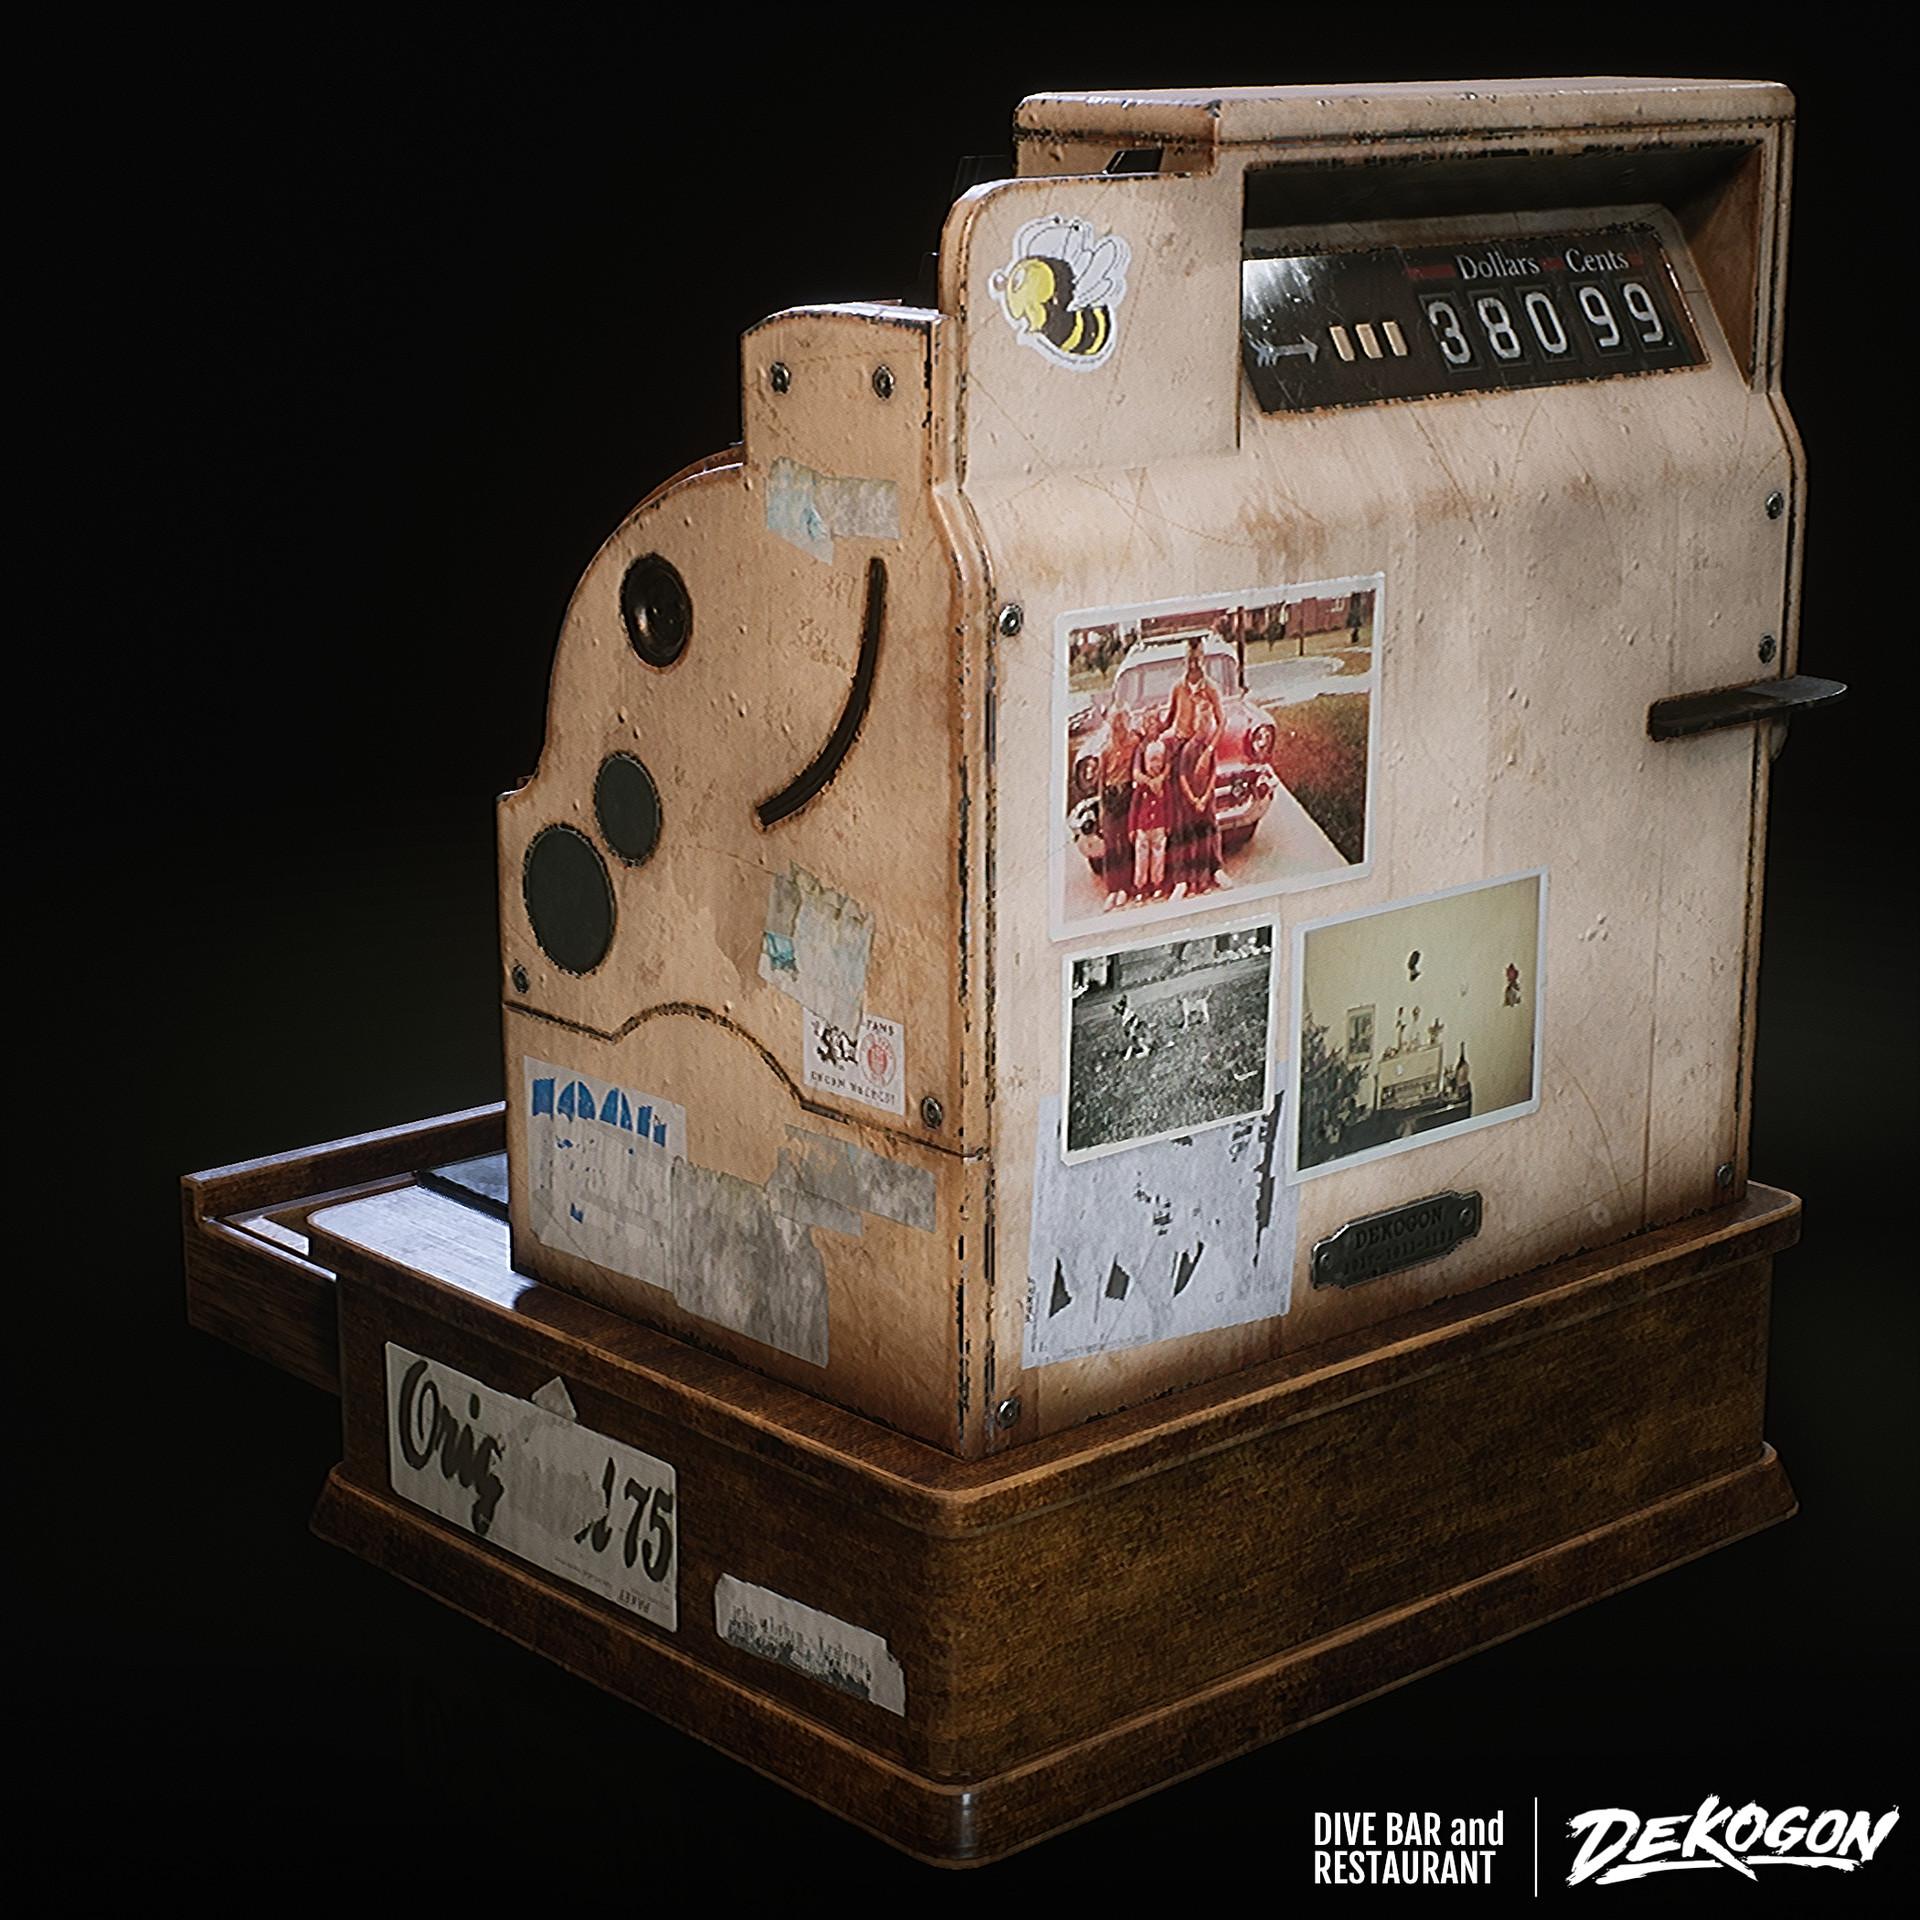 Wahyu nugraha cashregister 01 06